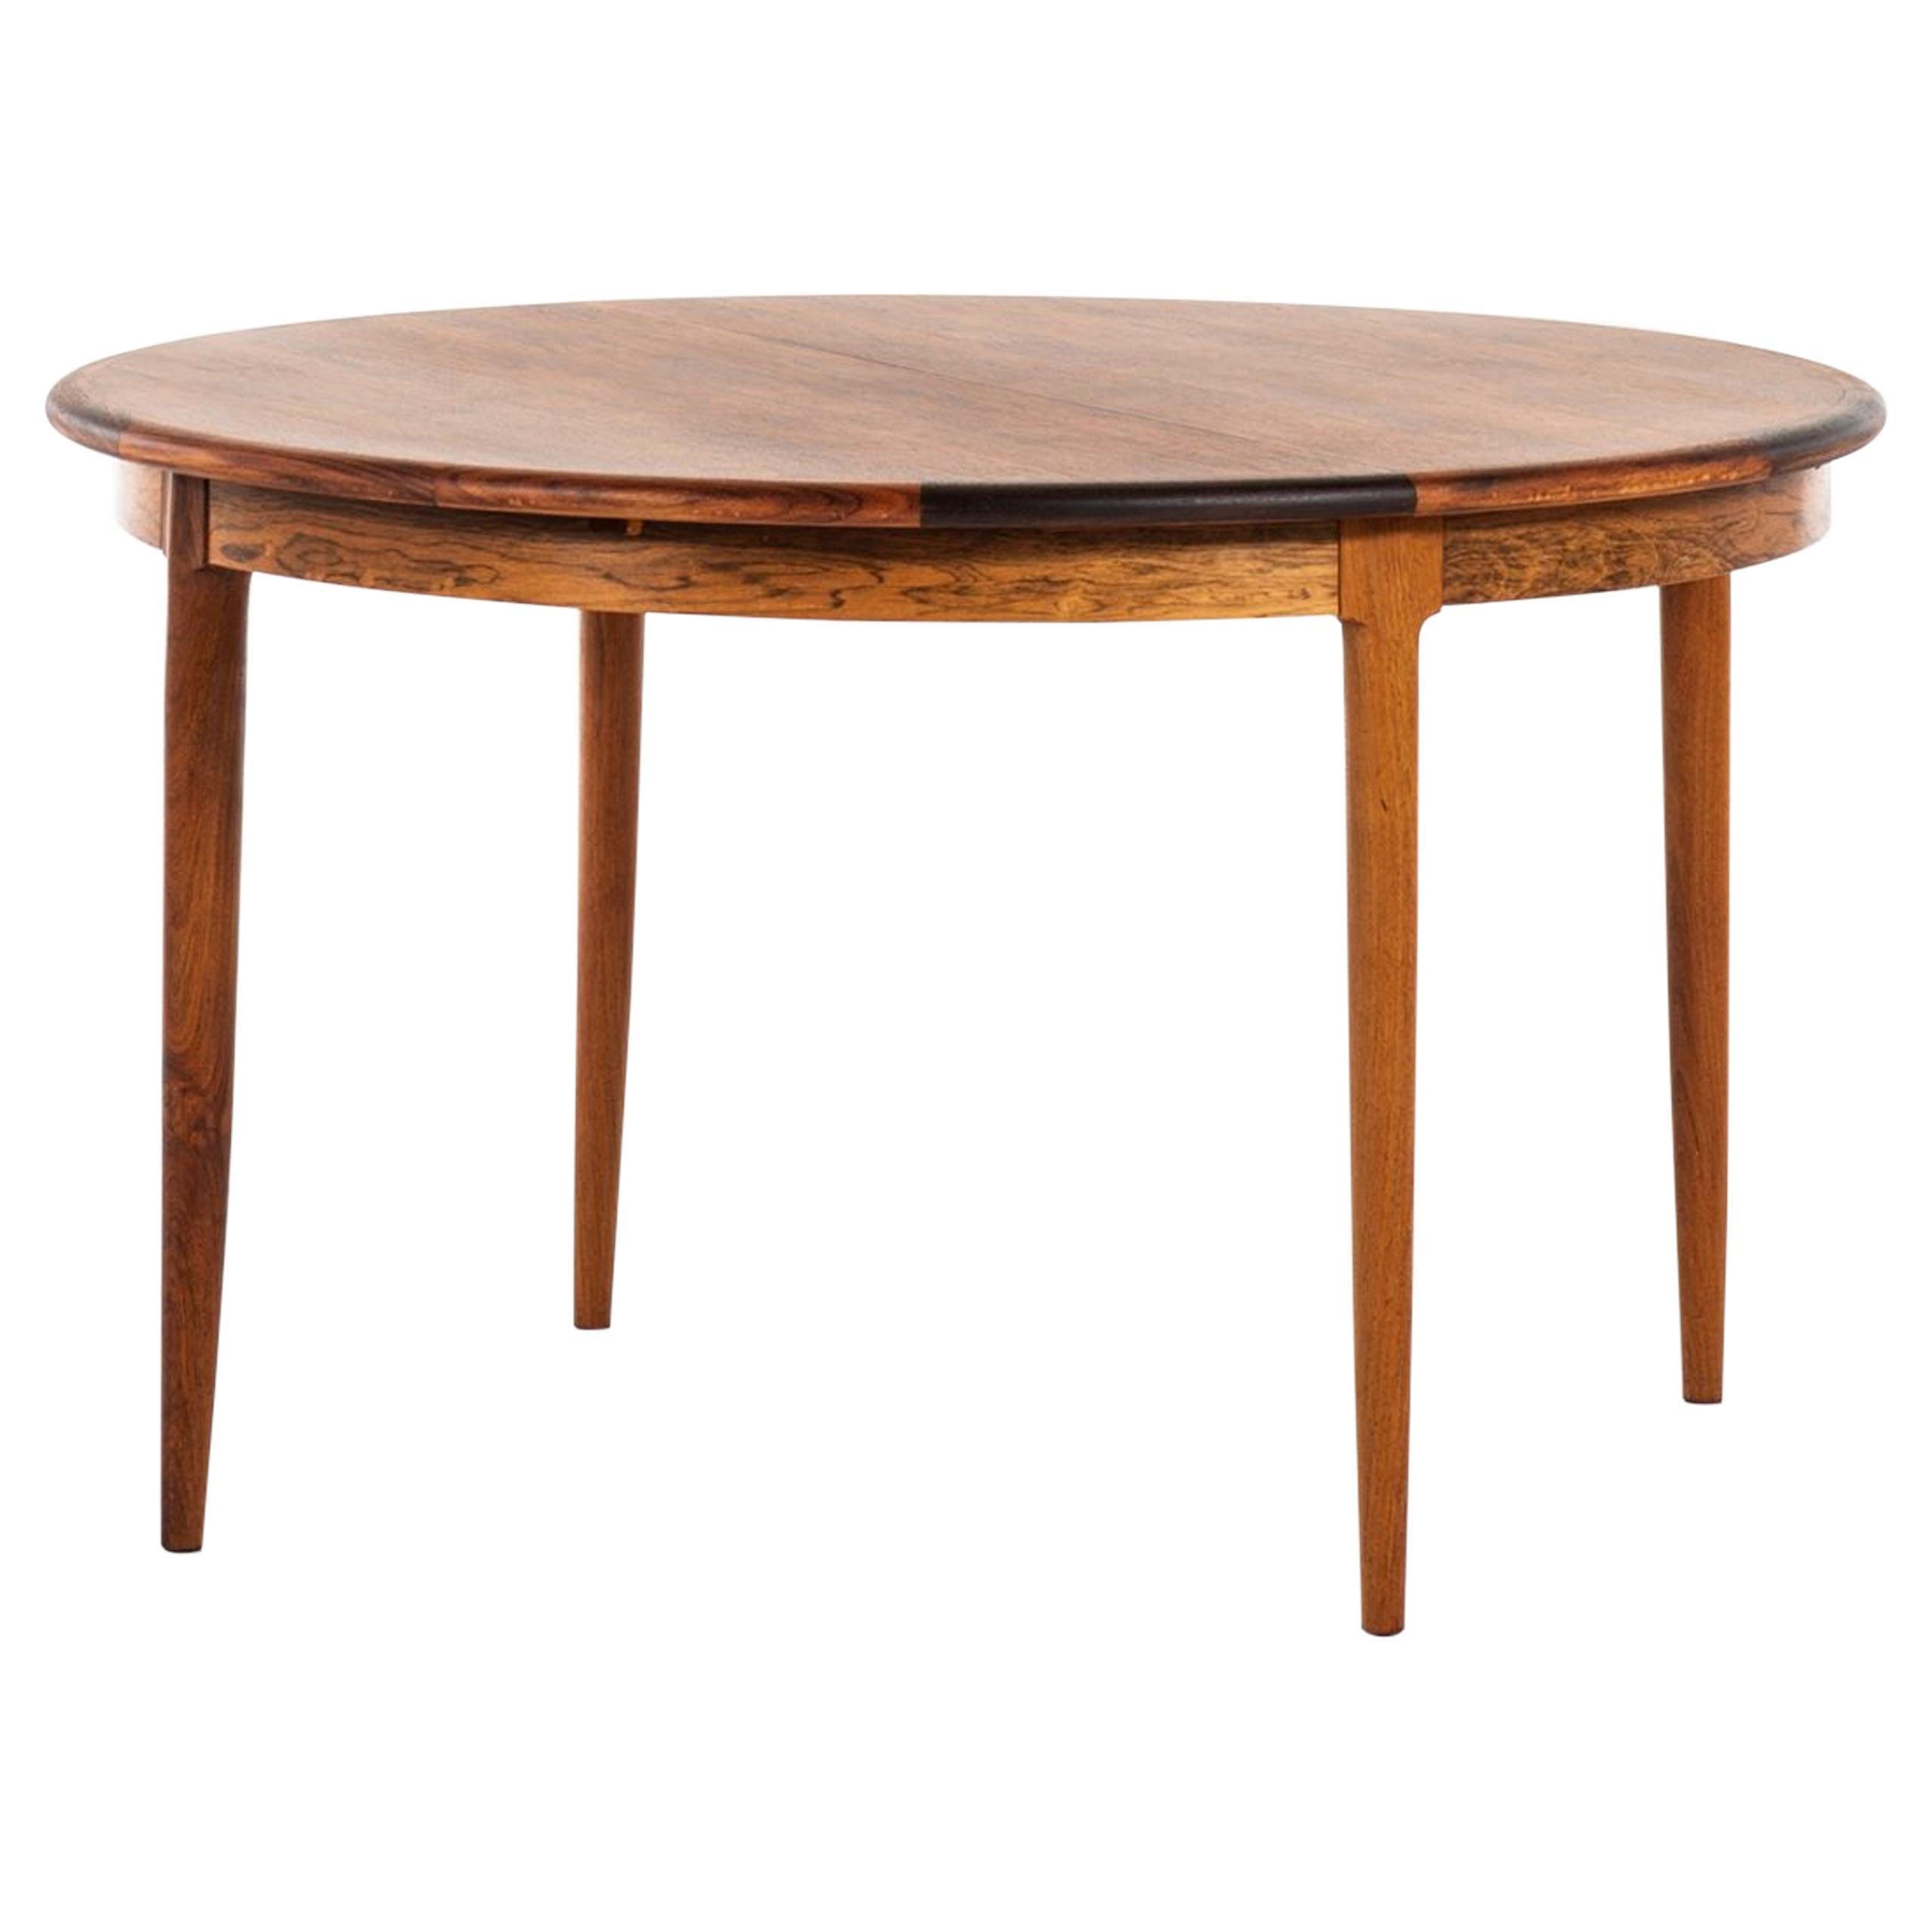 Niels O. Møller Dining Table Produced by J.L. Møllers Møbelfabrik in Denmark